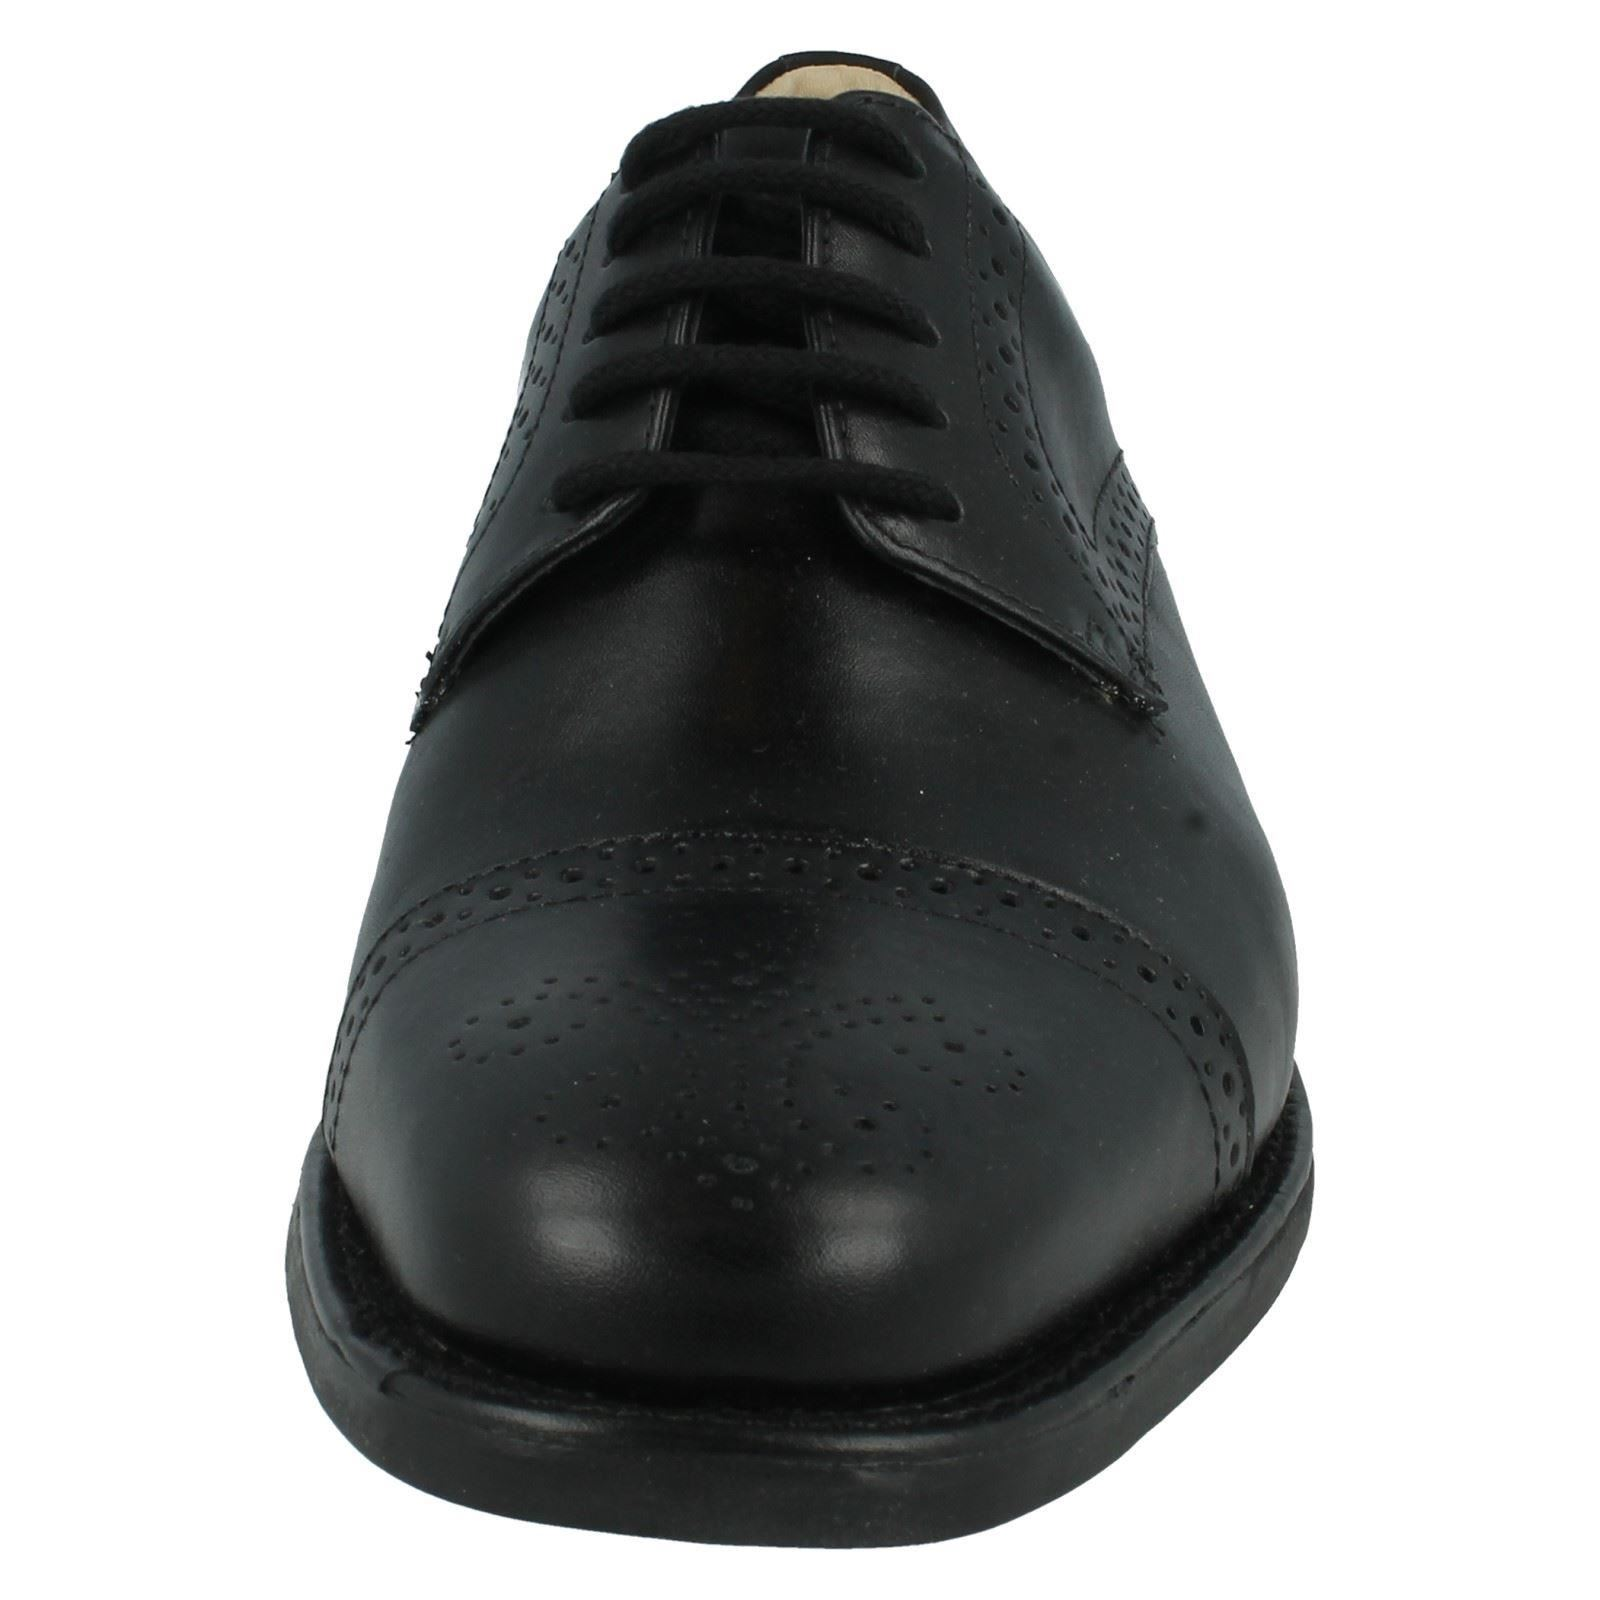 Mens Anatomic & Co Formal Brogue Shoes Araras ~ K